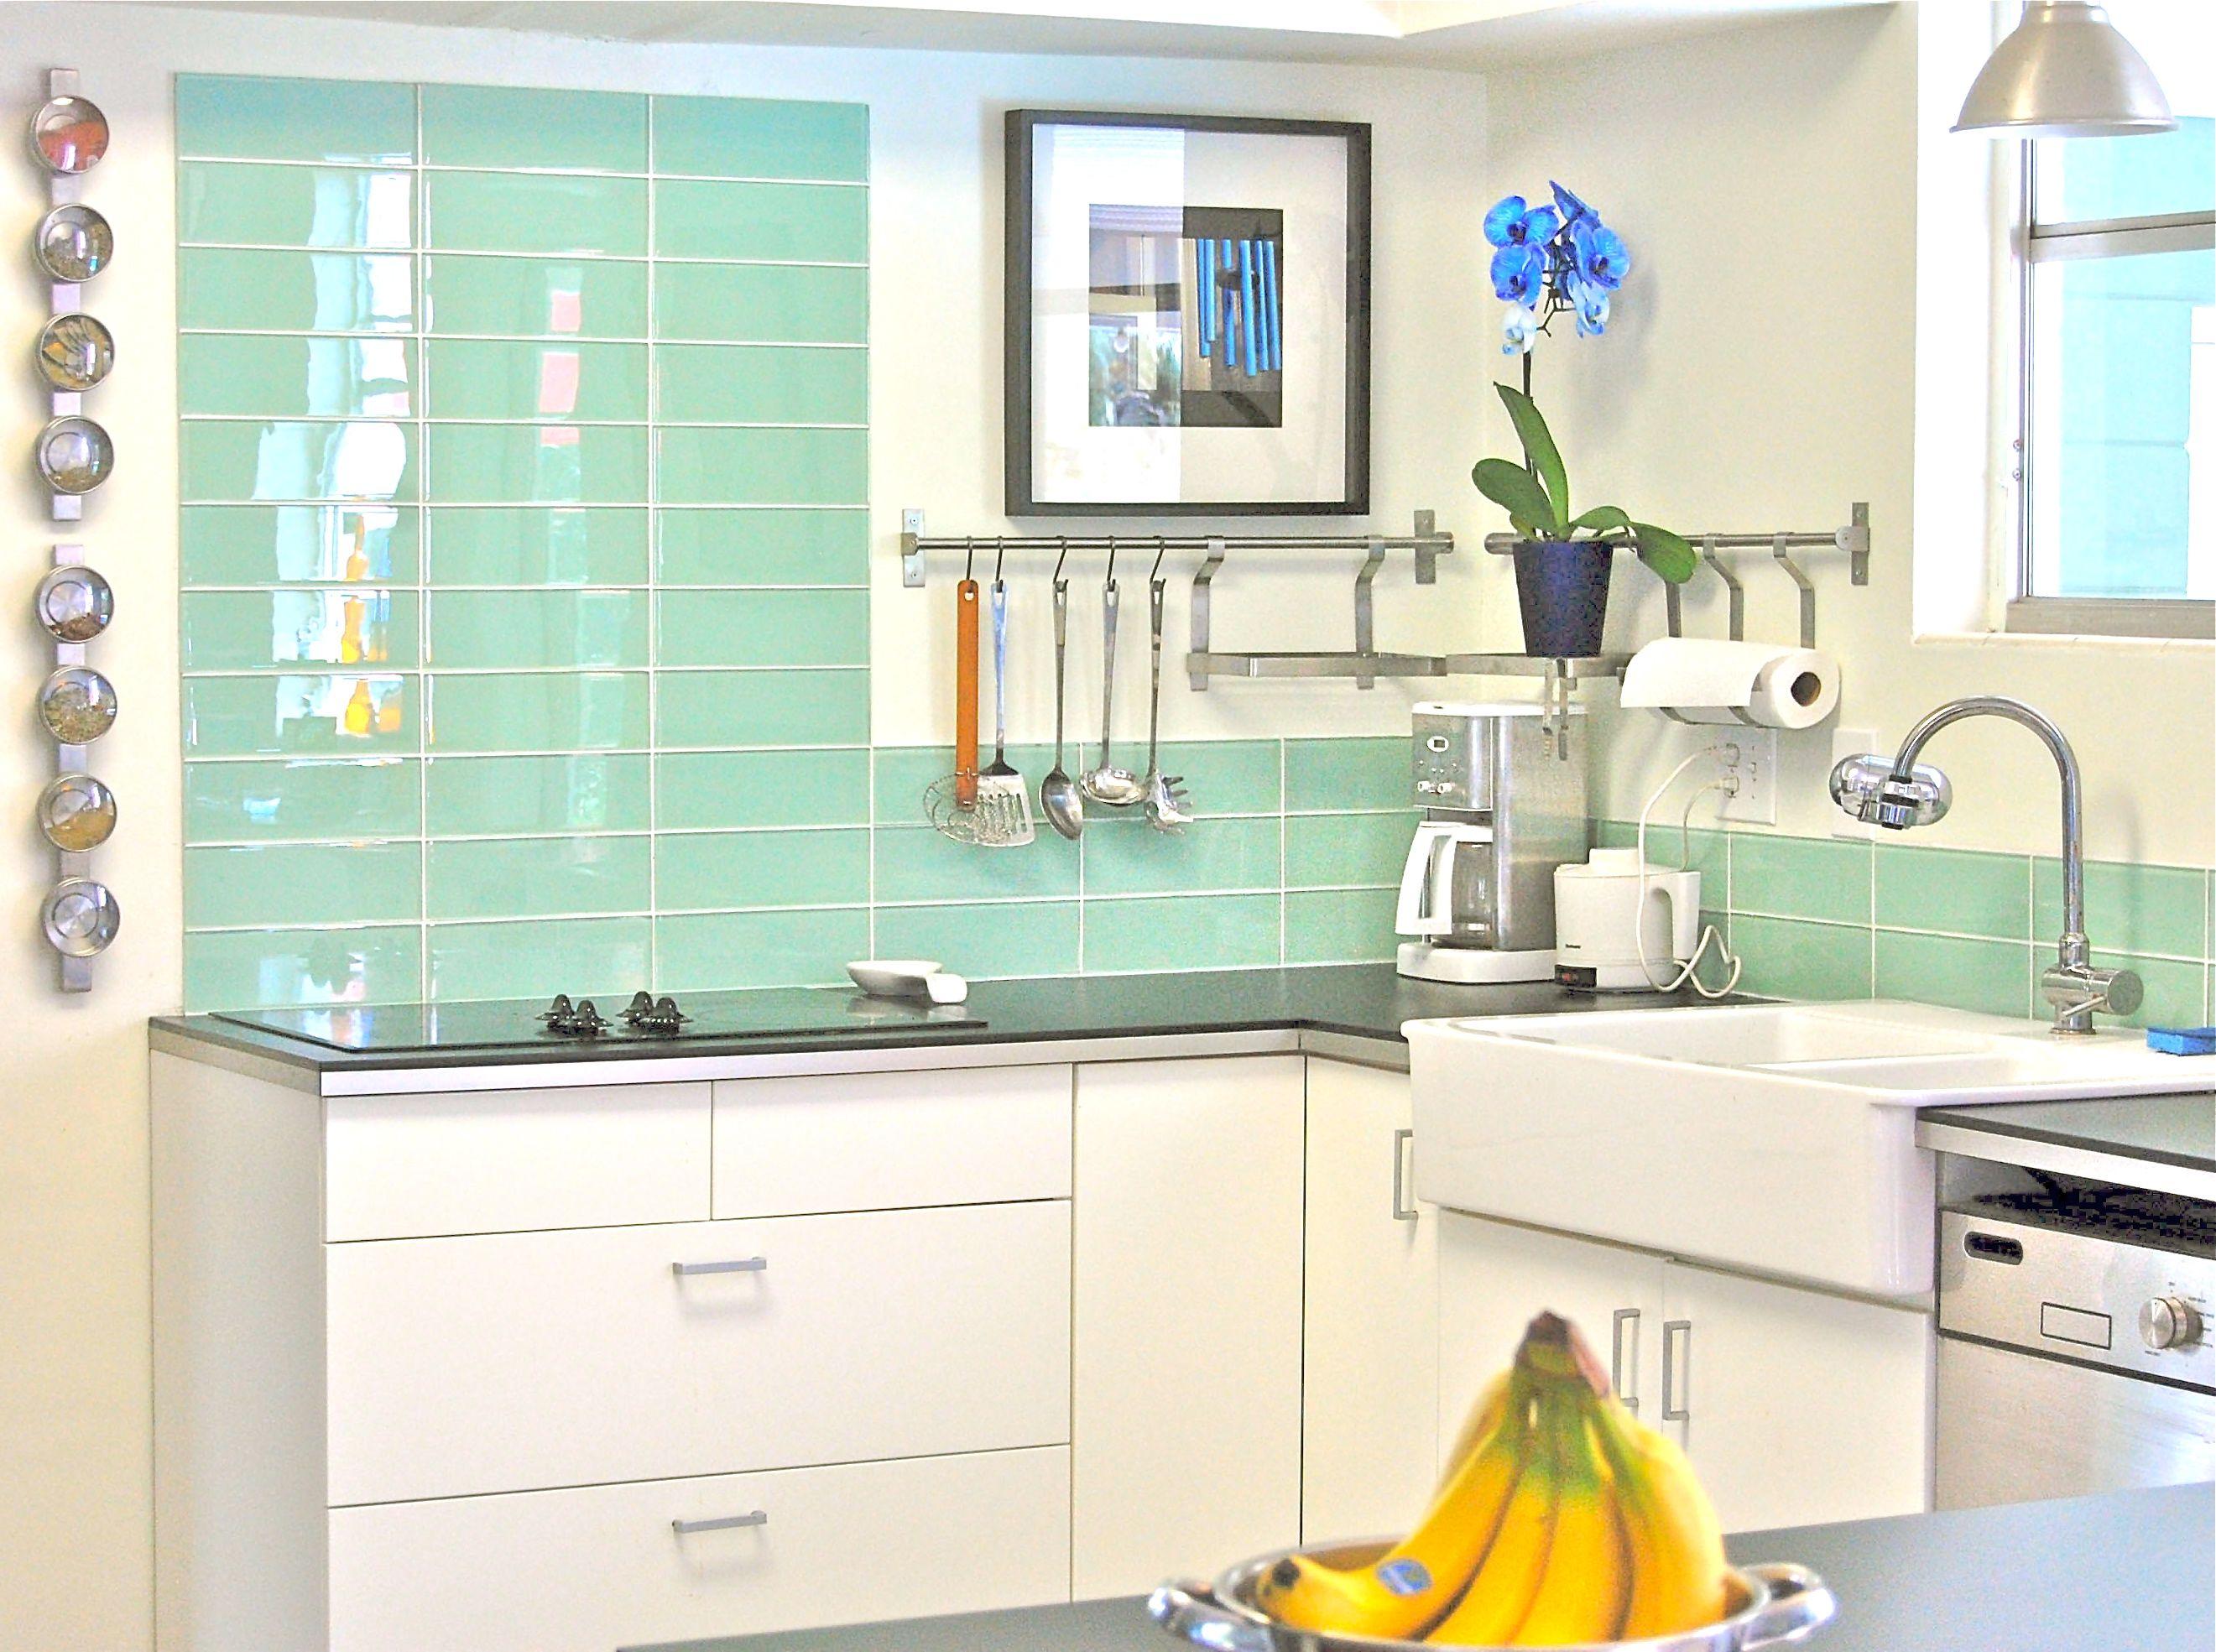 33088b6eb5c70cb740e8e4258226cdda - Get Small House Modern Kitchen Wall Tiles Fruit Design Pictures